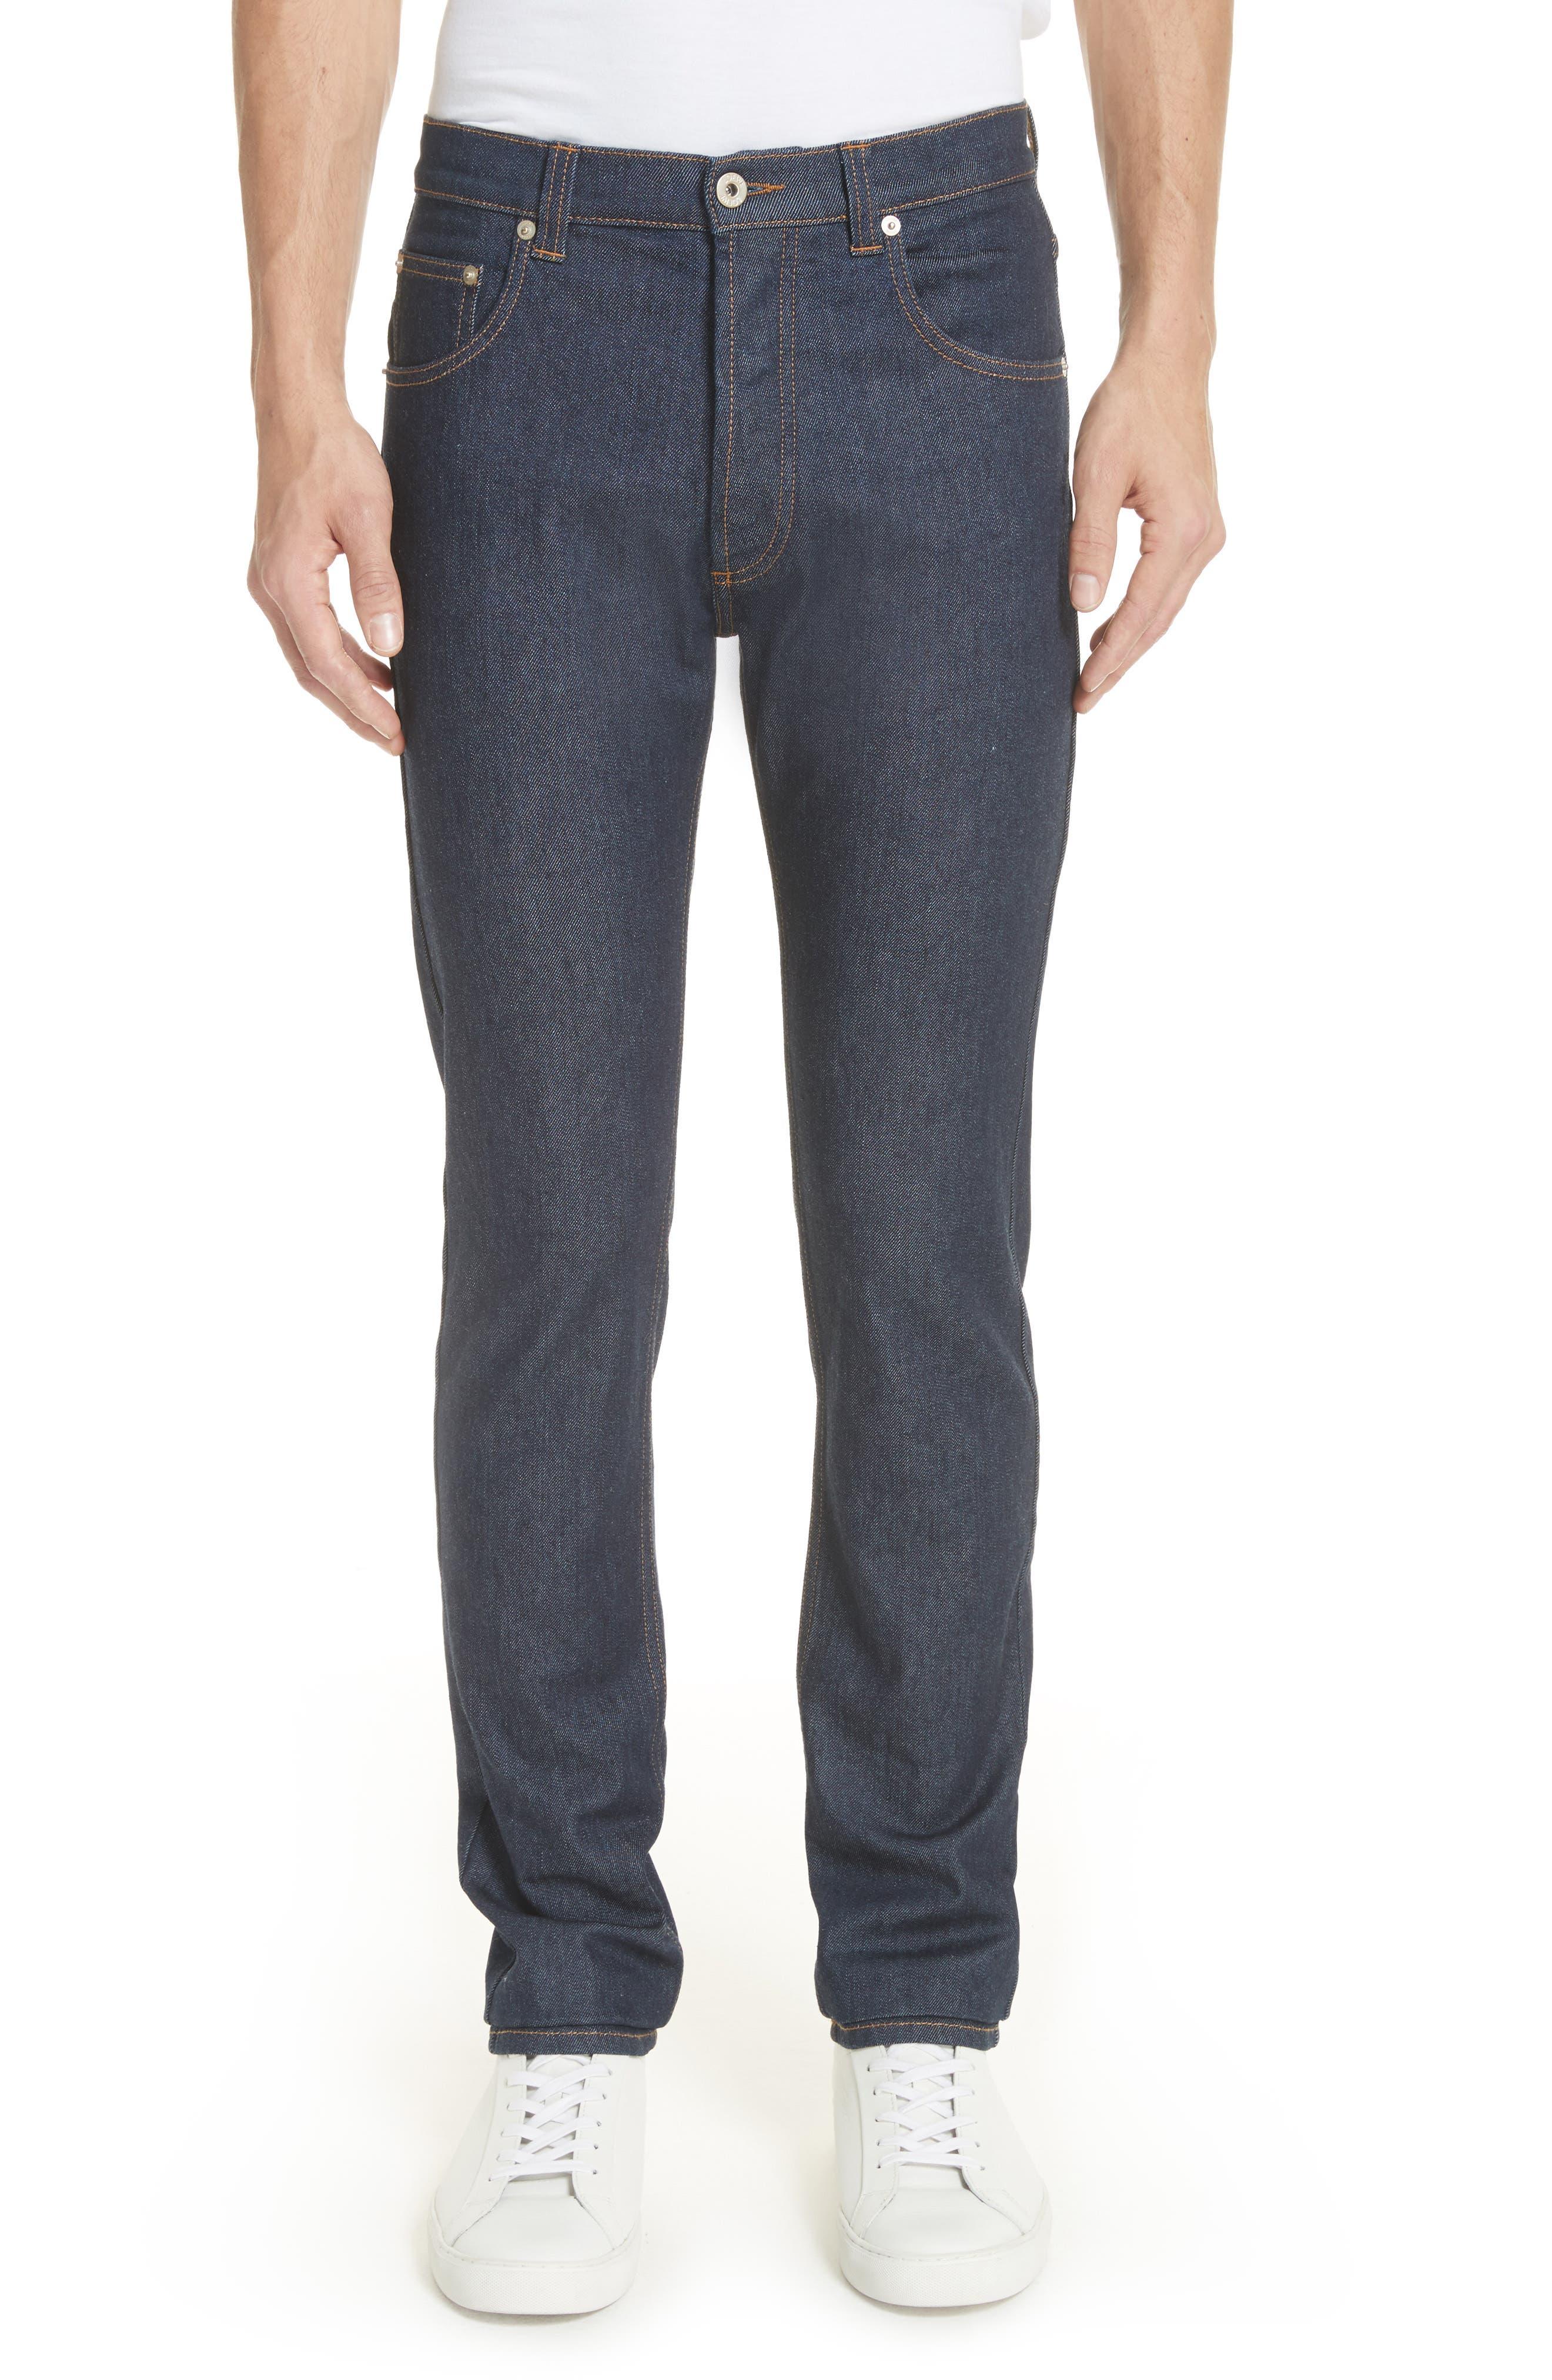 LOEWE Skinny Fit Jeans, Main, color, BLUE DENIM